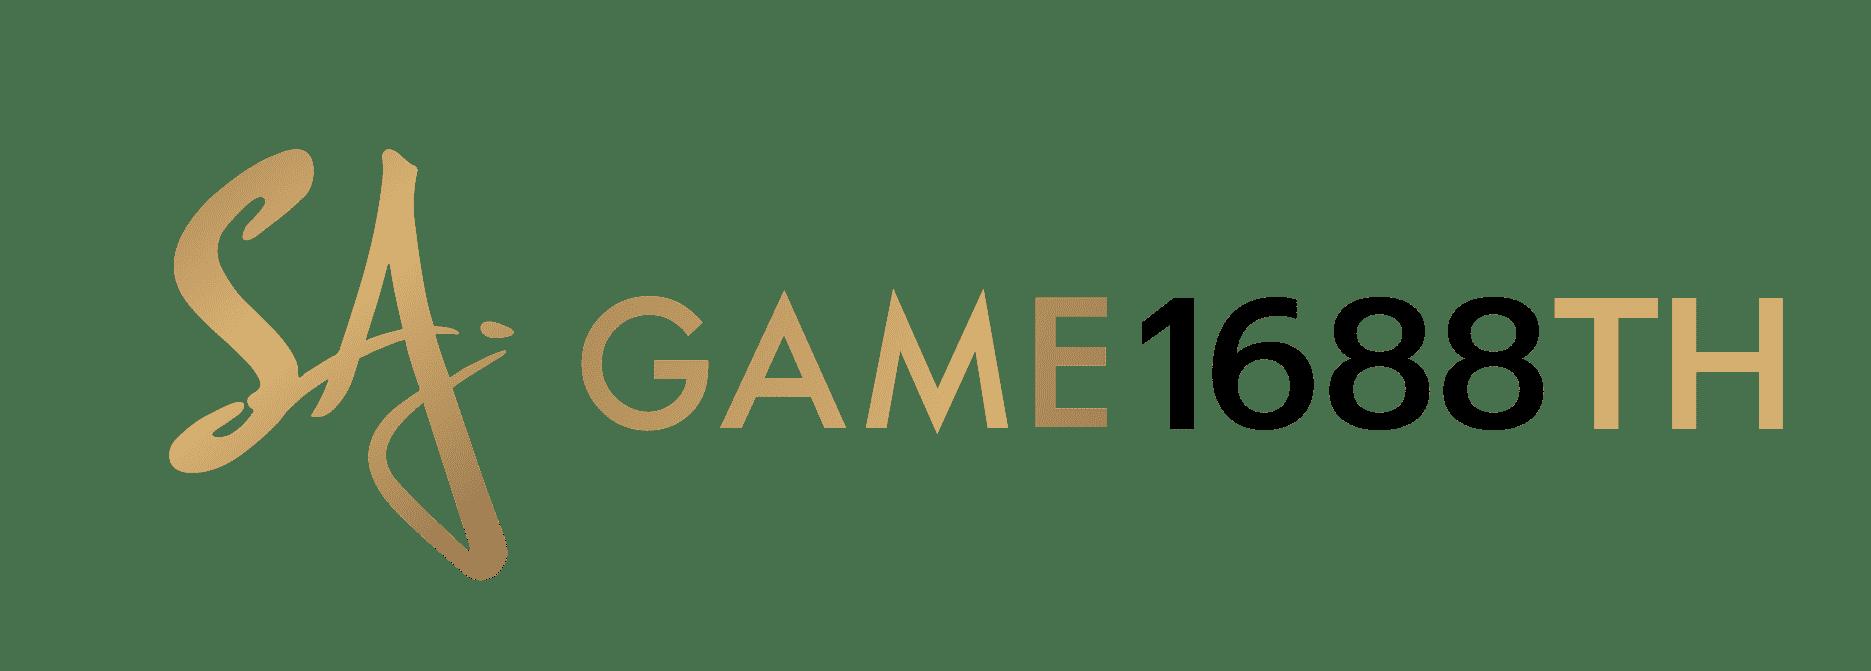 SAGAME บาคาร่า SAGAMING คาสิโนออนไลน์ | SAGAME1688